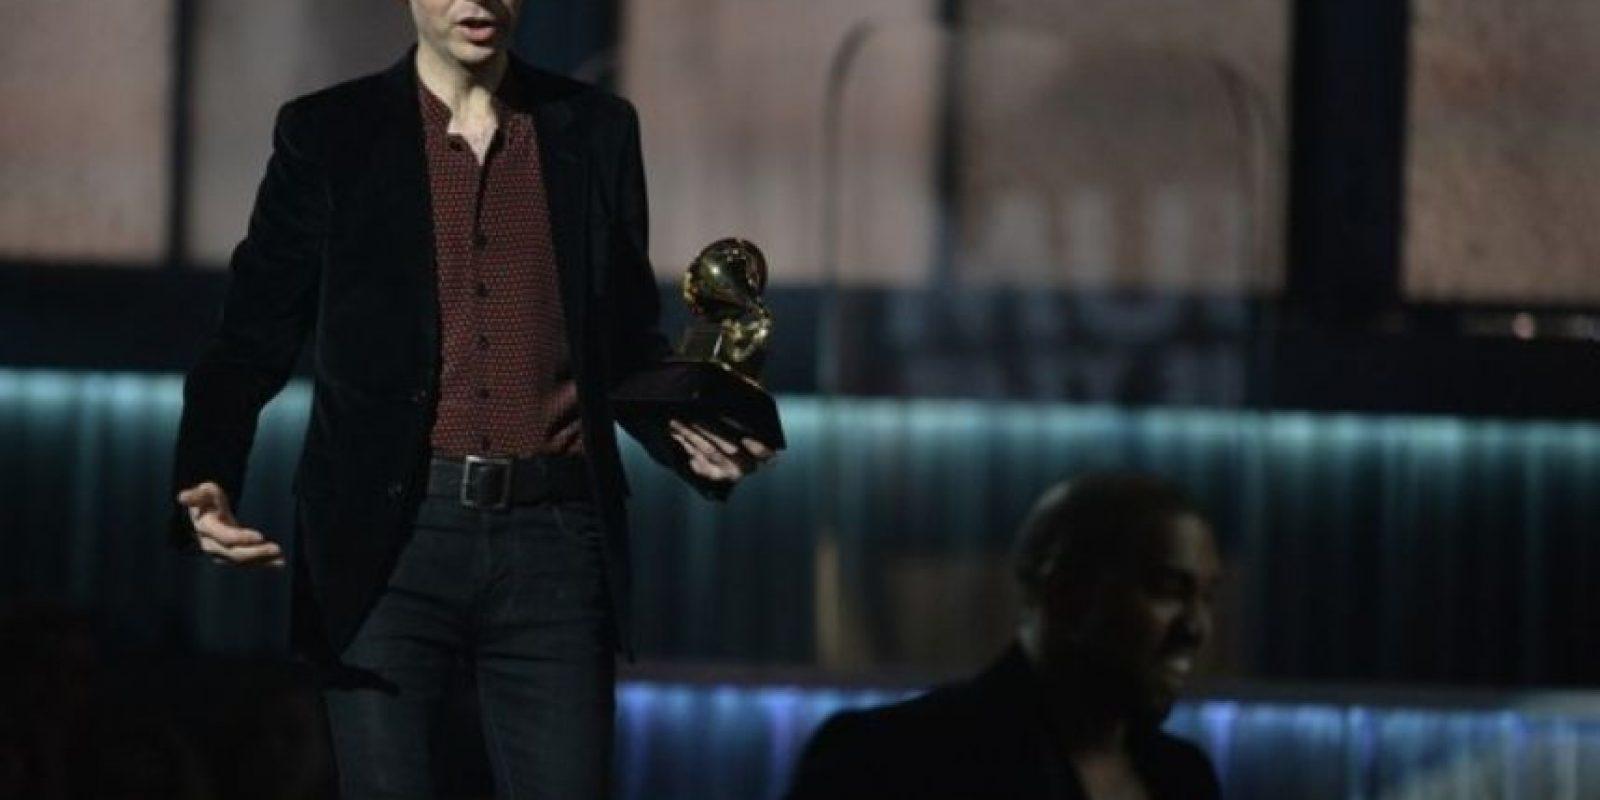 Apenas Beck le ganó a Beyonce, Kanye West quiso boicotearlo. Foto:Getty Images